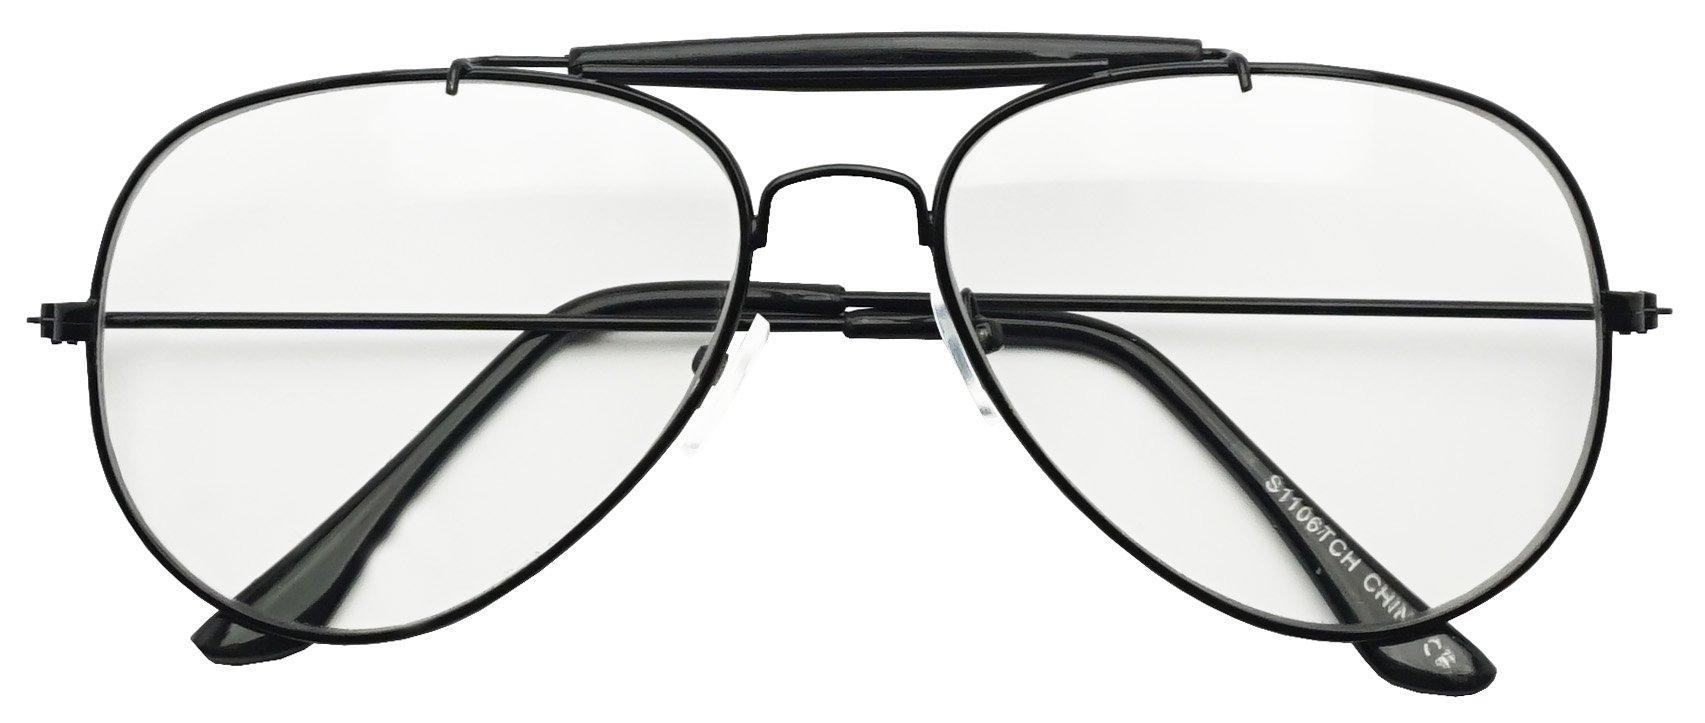 Photochromic Adaptive Clear Lens Aviator Glasses W/Sun Senor Transition Light Tinted Sunglassses (Black, 60) by SunglassUP